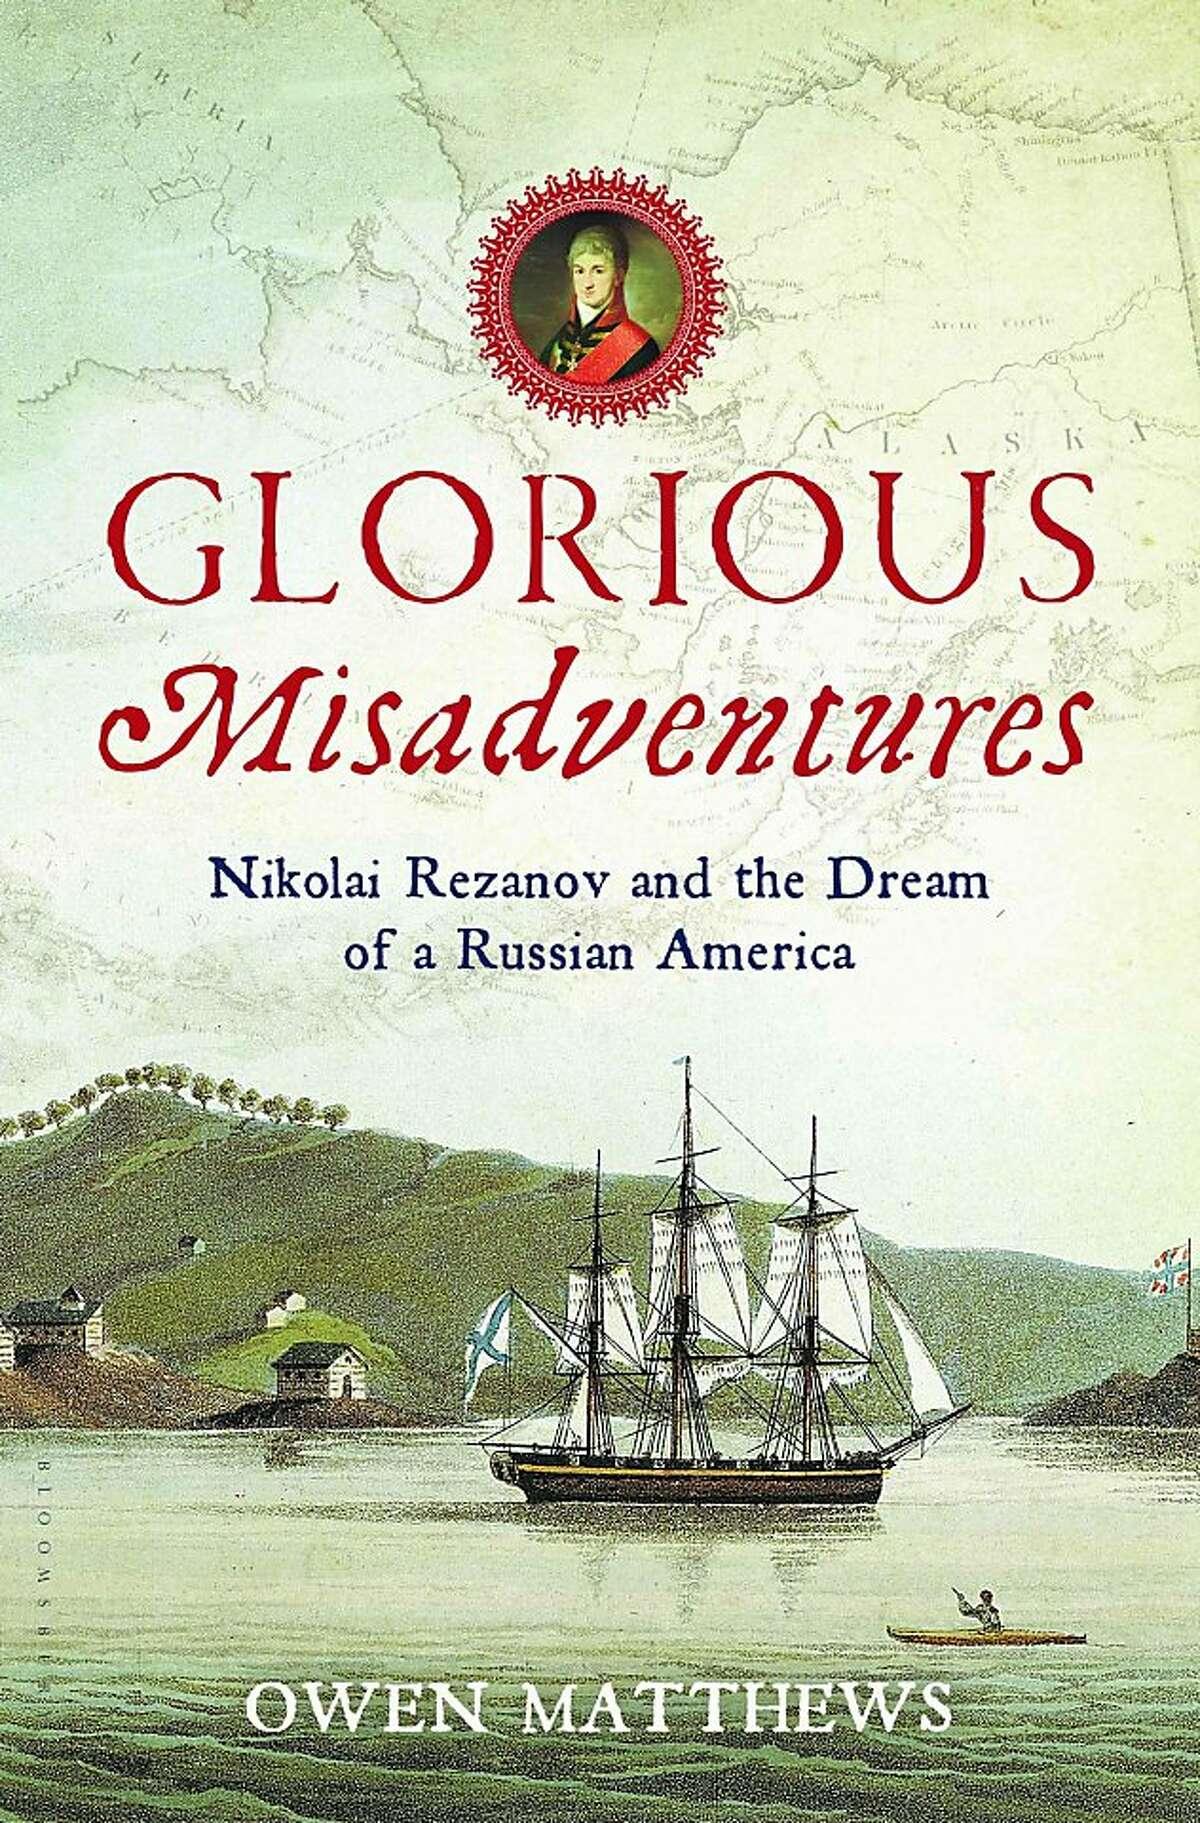 Glorious Misadventures: Nikolai Rezanov and the Dream of a Russian America, by Owen Matthews